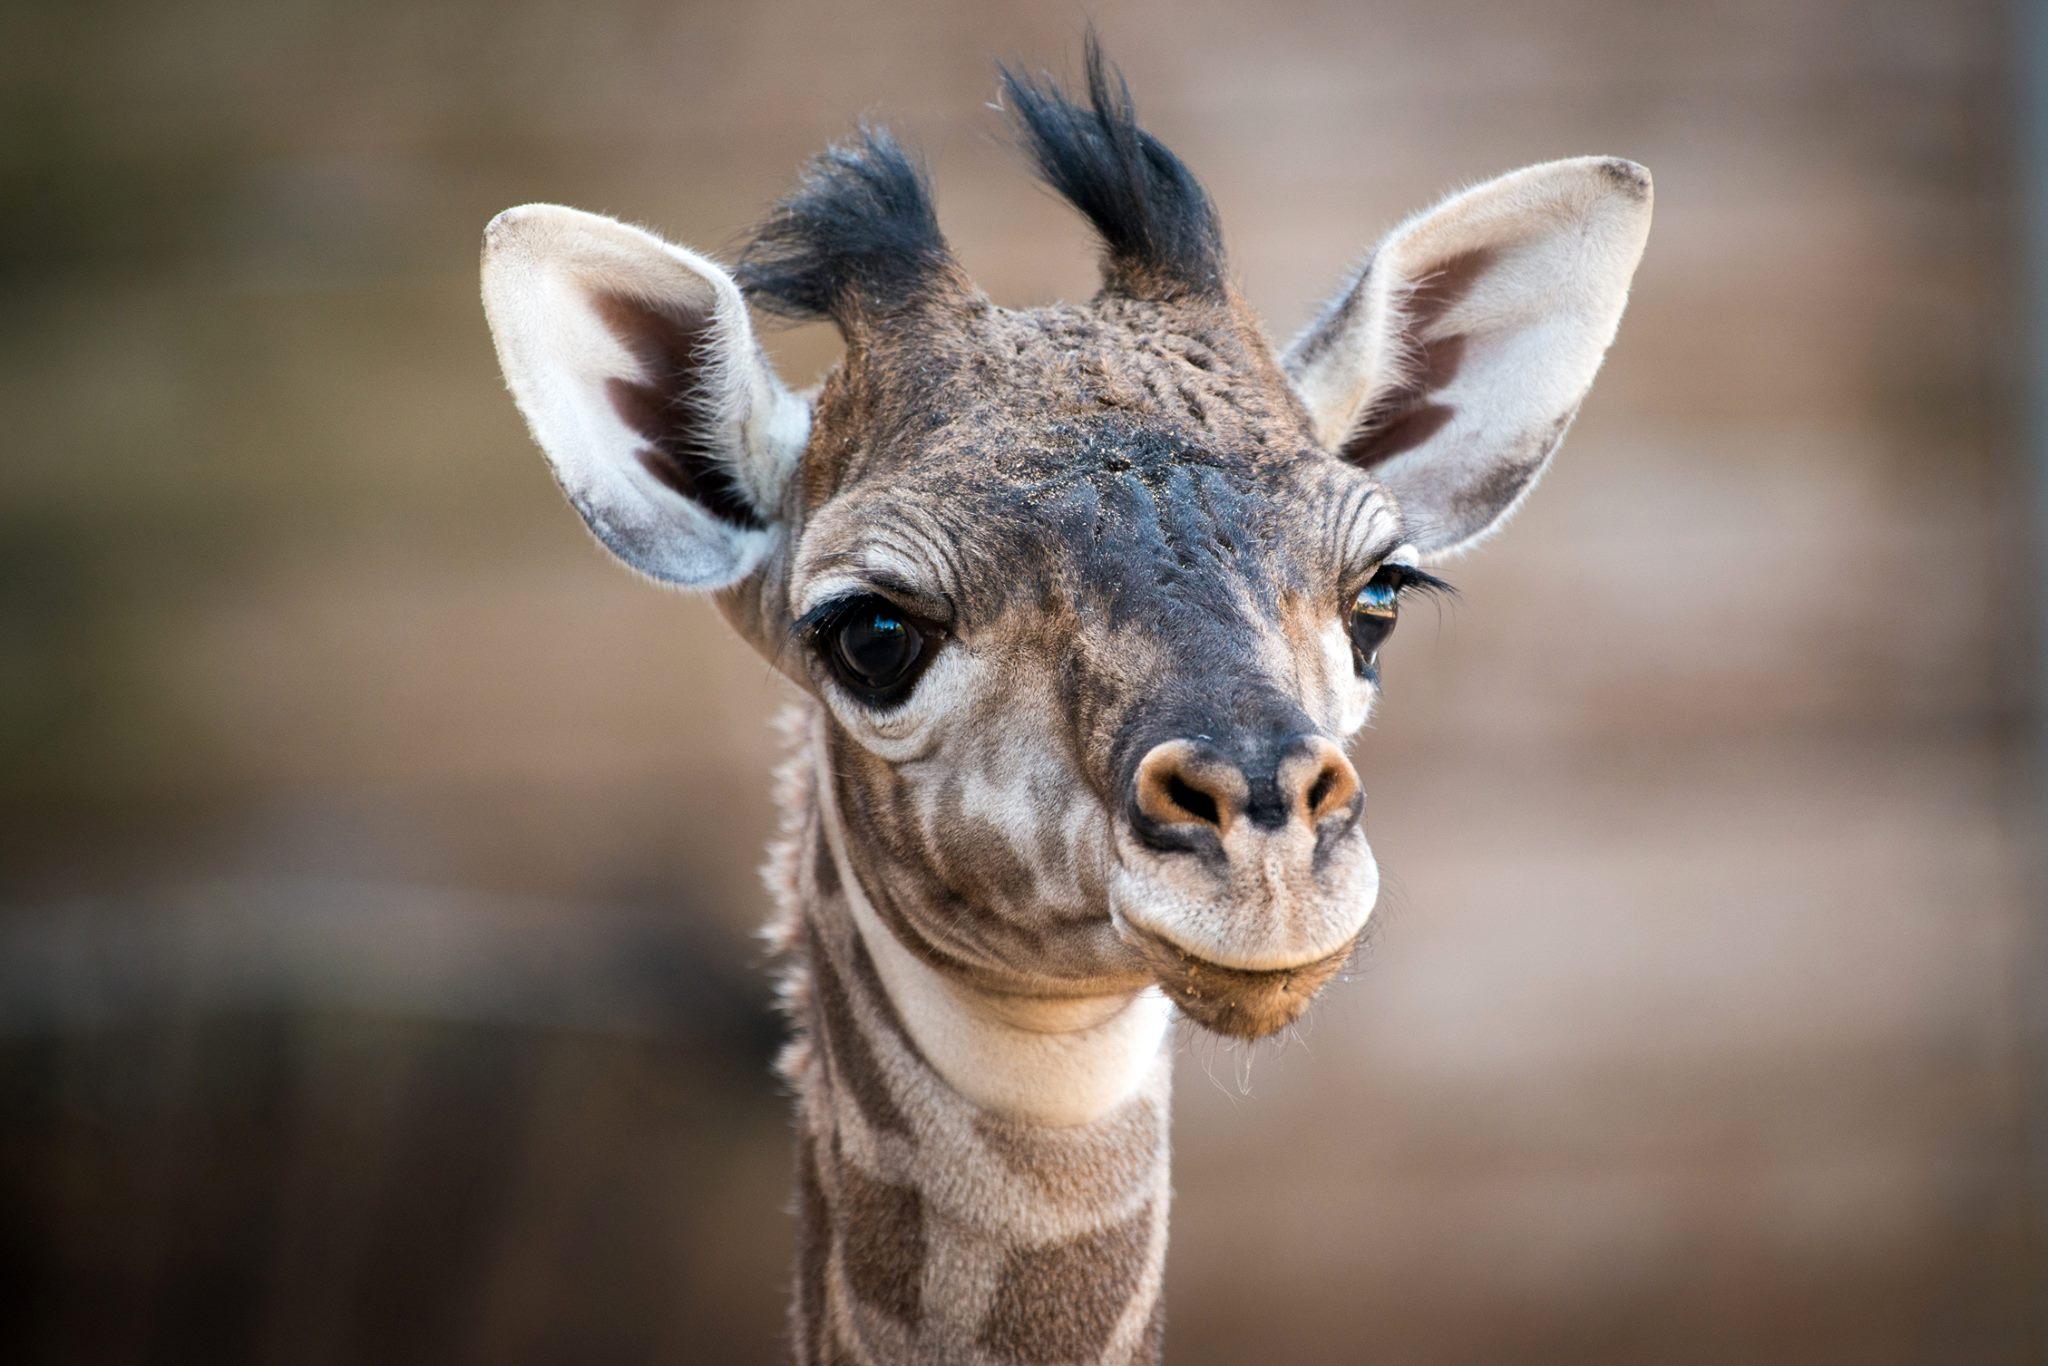 Houston Zoo S New Giraffe Finally Has Name Houston Chronicle